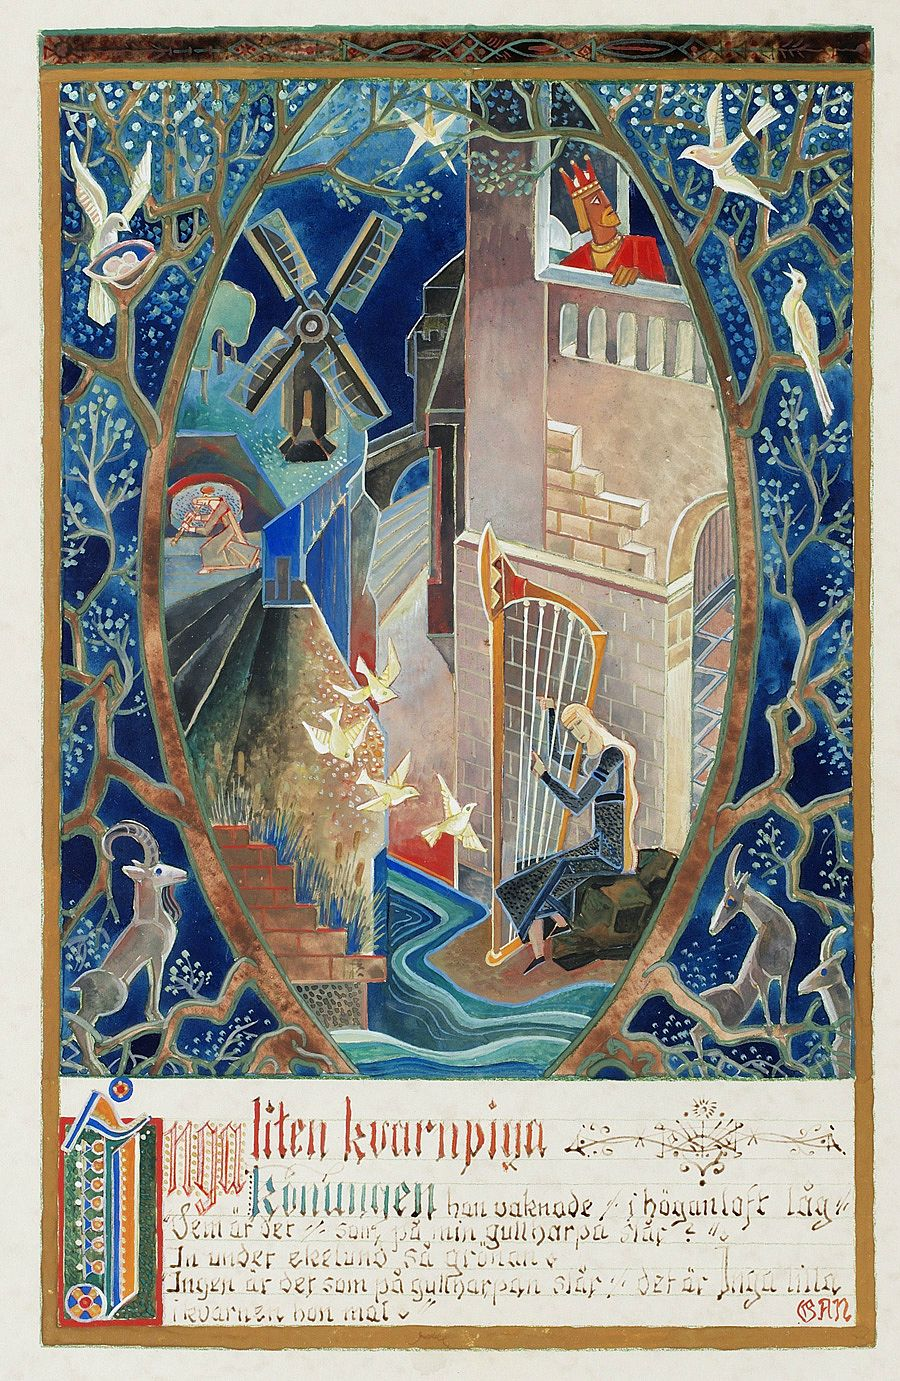 Beautiful Vintage Illustrations for Scheherazade's Stories and Scandinavian Fairy Tales by Swedish Modernist Pioneer GAN